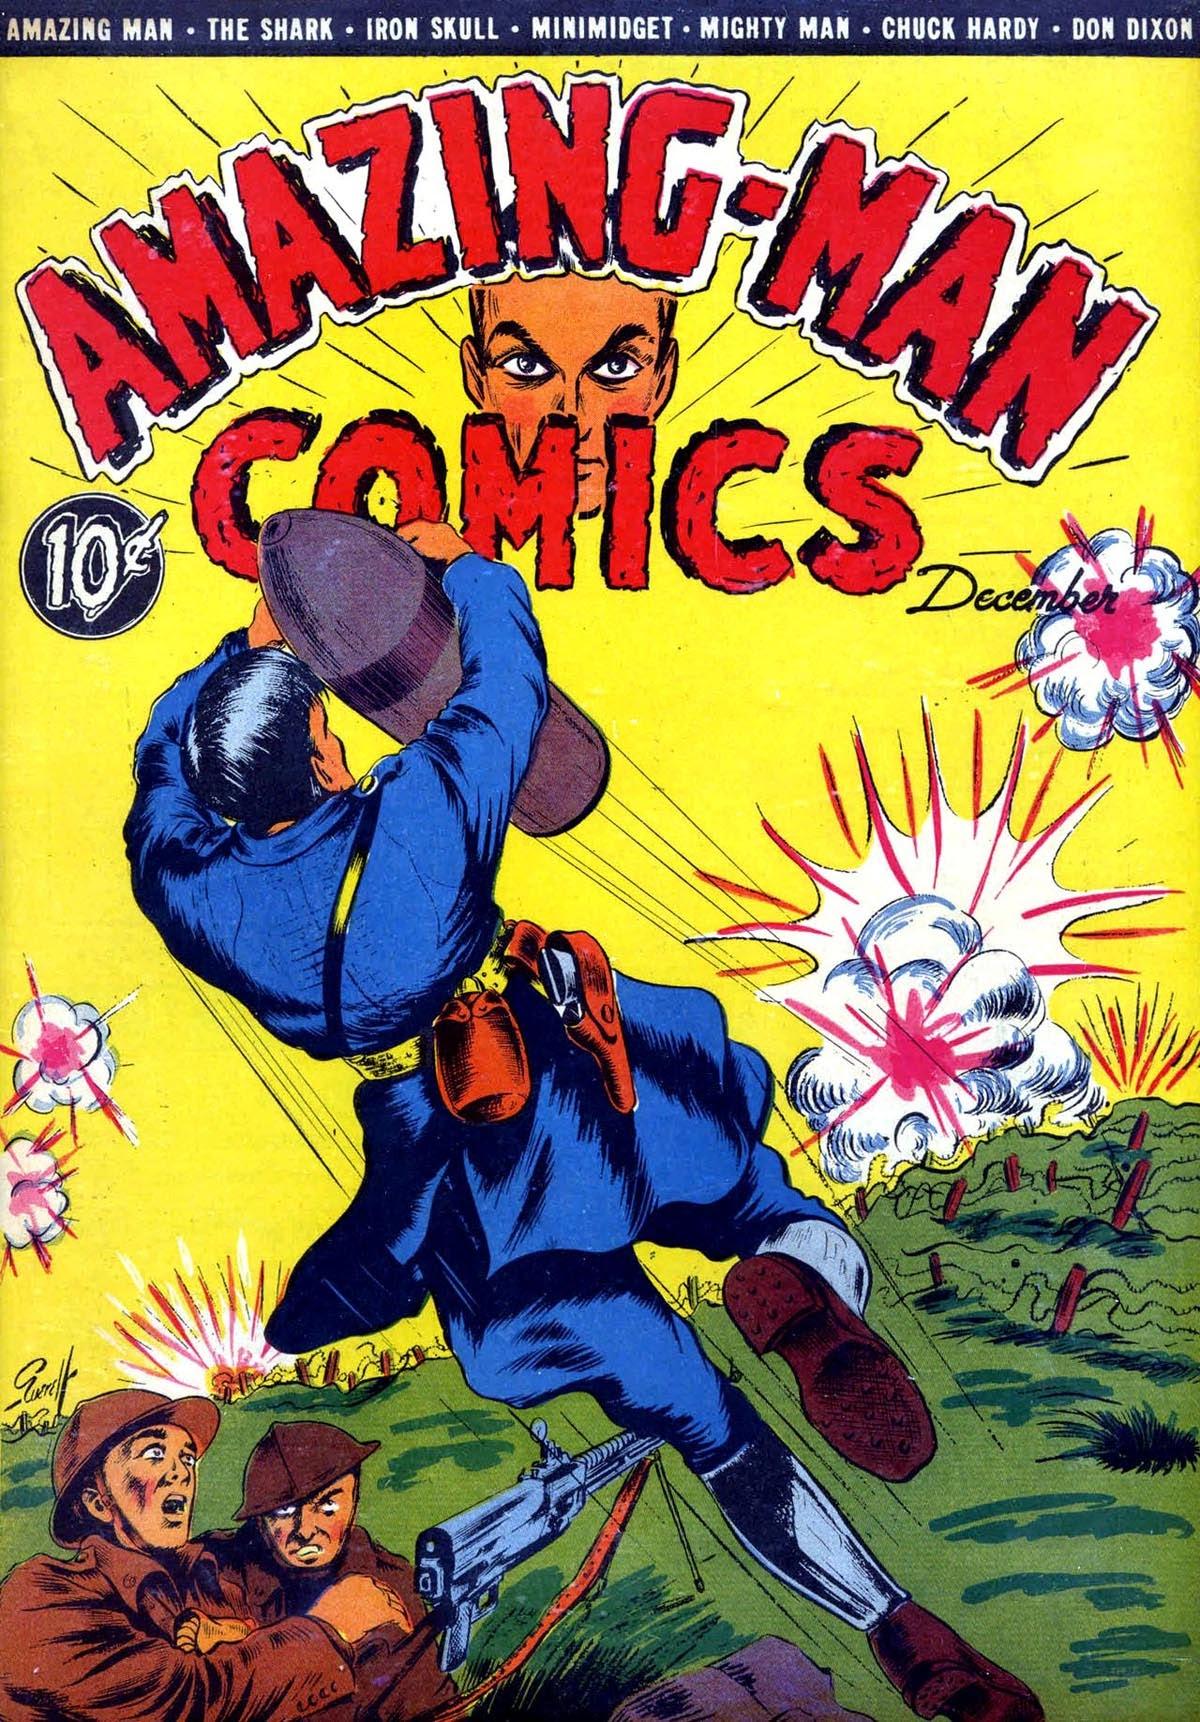 Read online Amazing Man Comics comic -  Issue #8 - 1